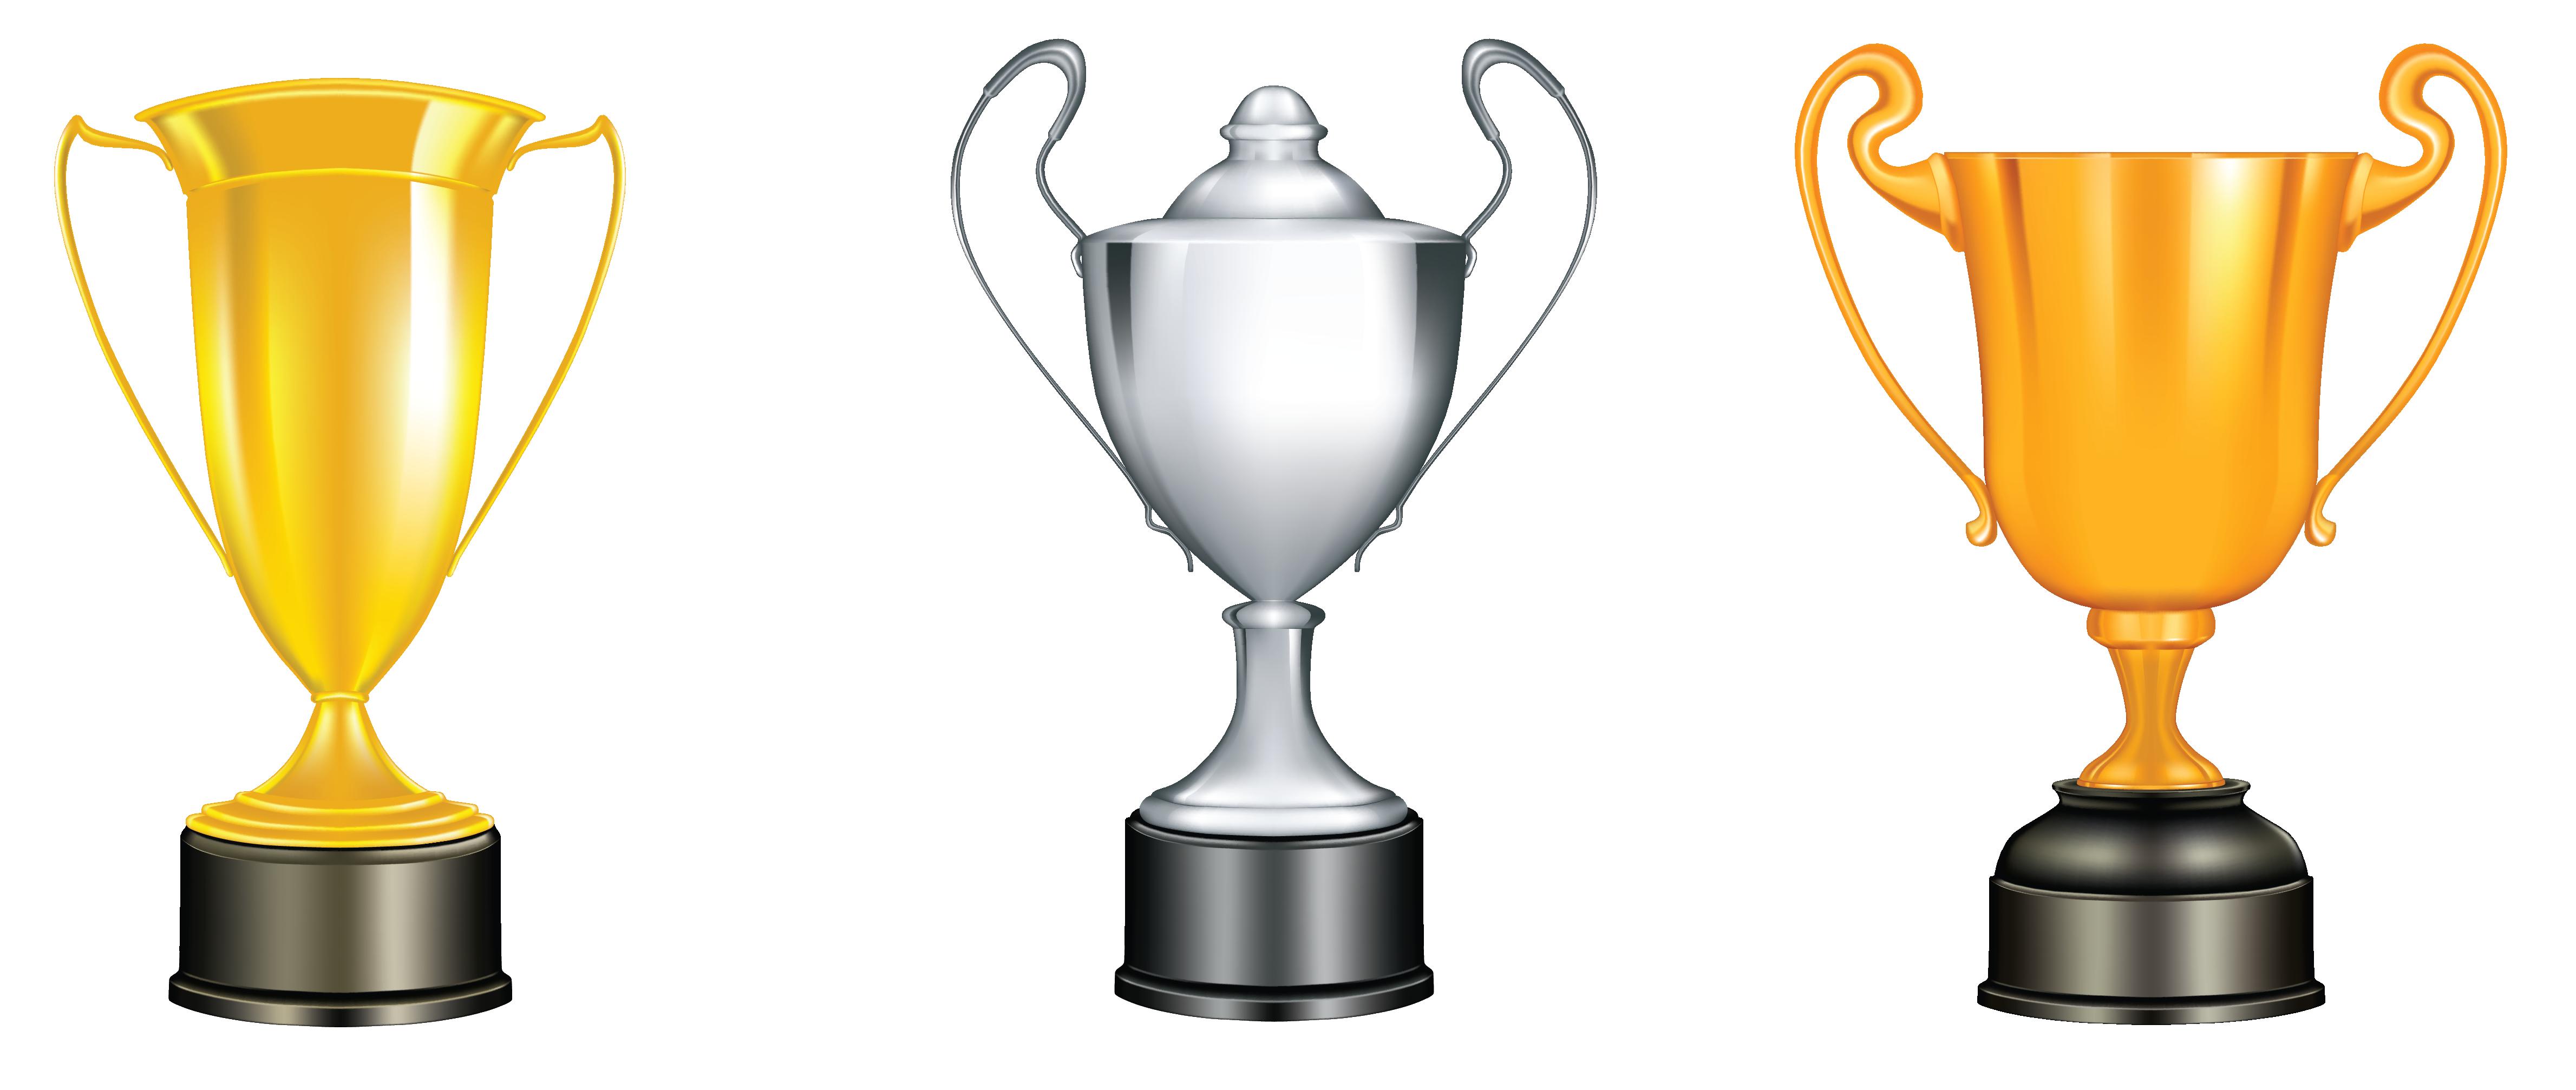 Free clipart baseball trophy svg black and white download Trophy Clipart | jokingart.com svg black and white download